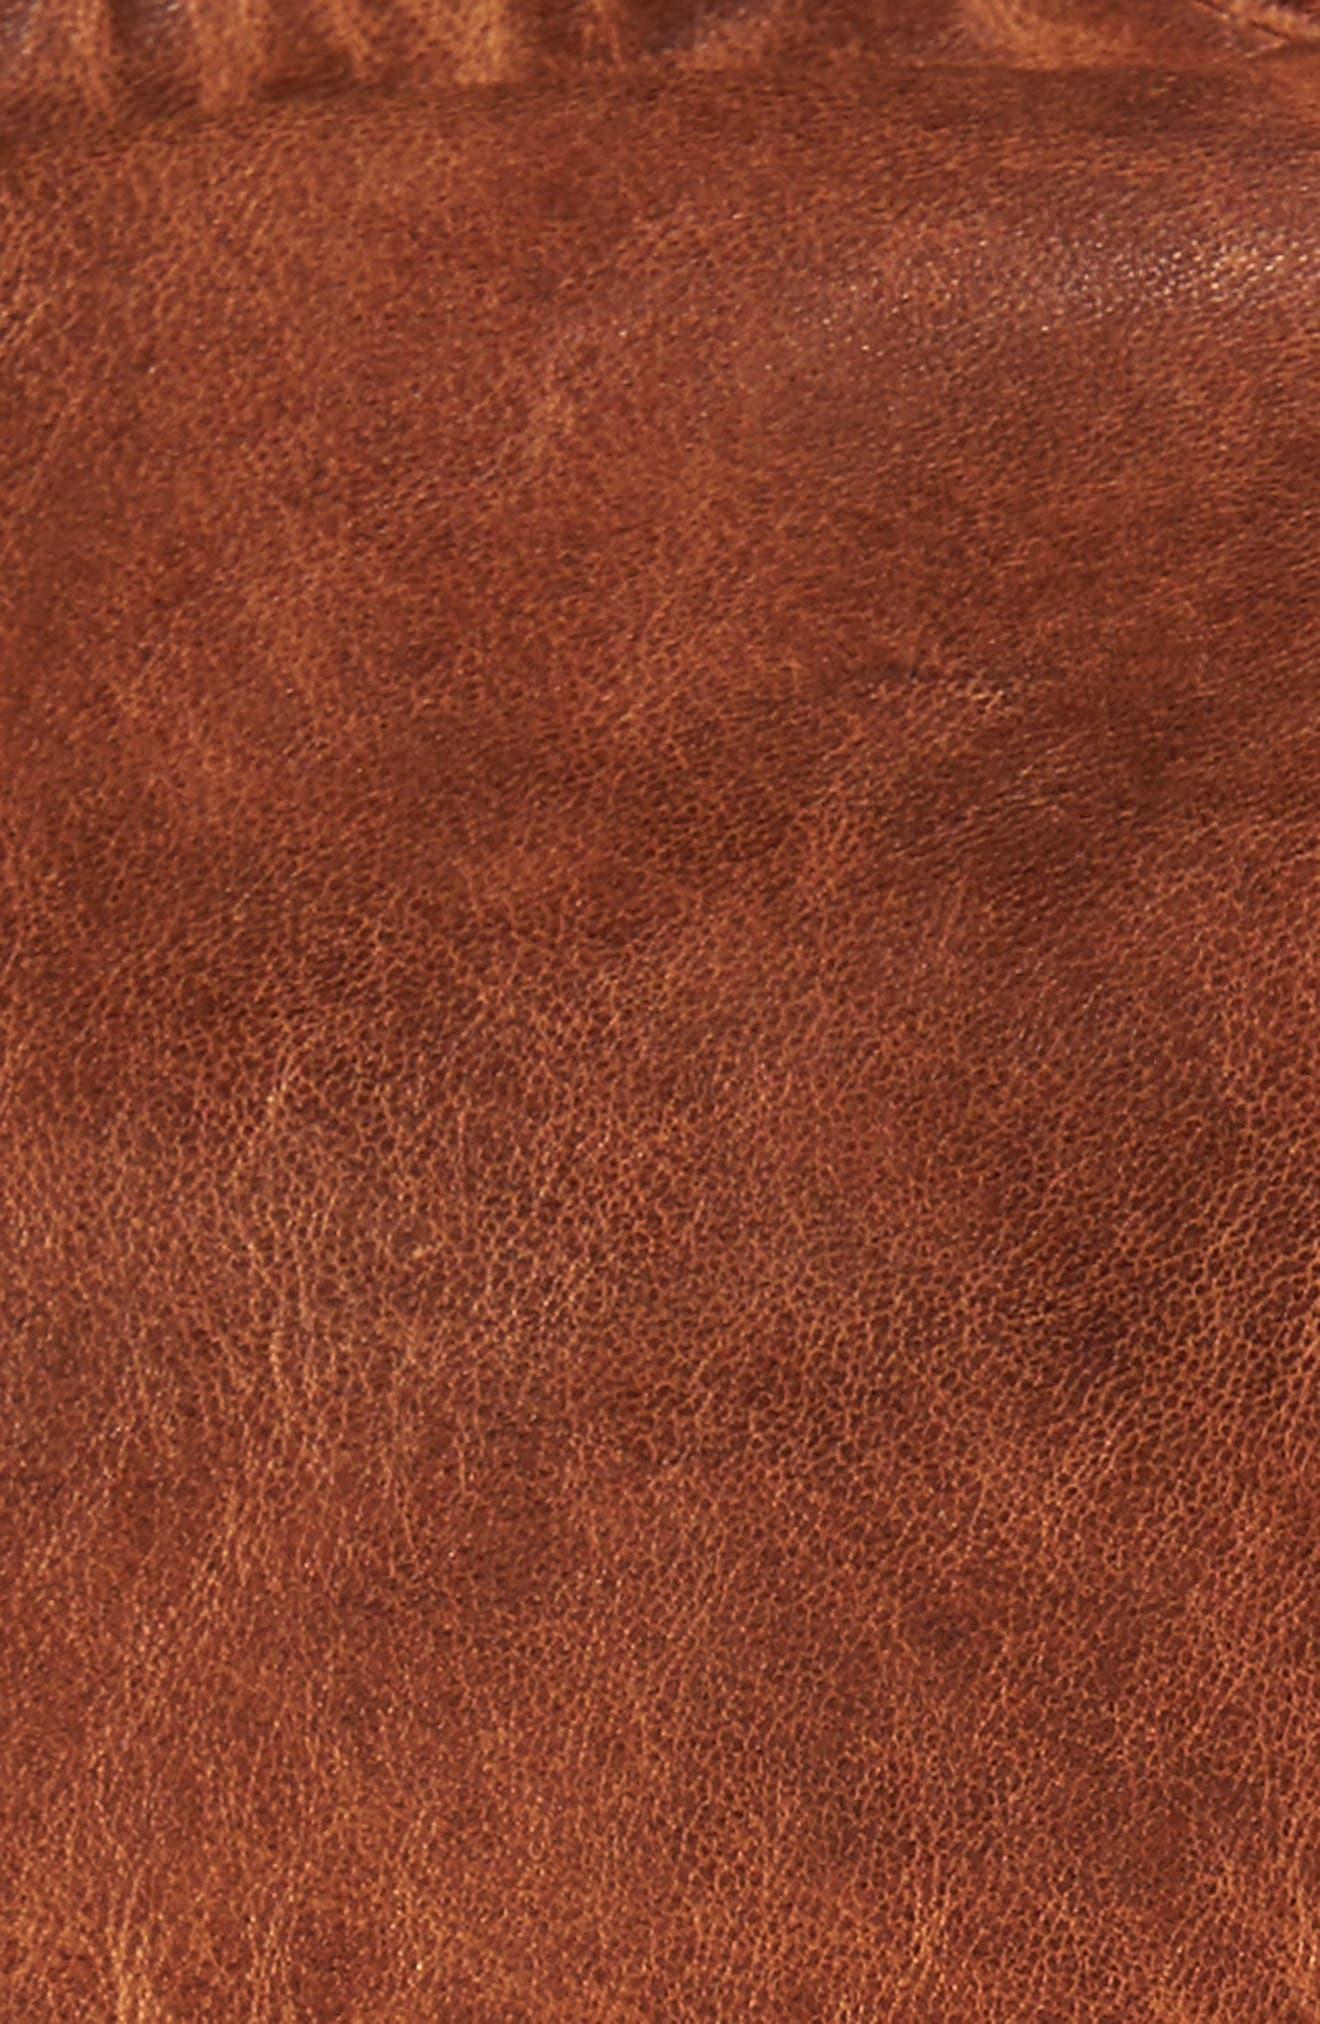 Washed Lamb Leather Jacket,                             Alternate thumbnail 5, color,                             210